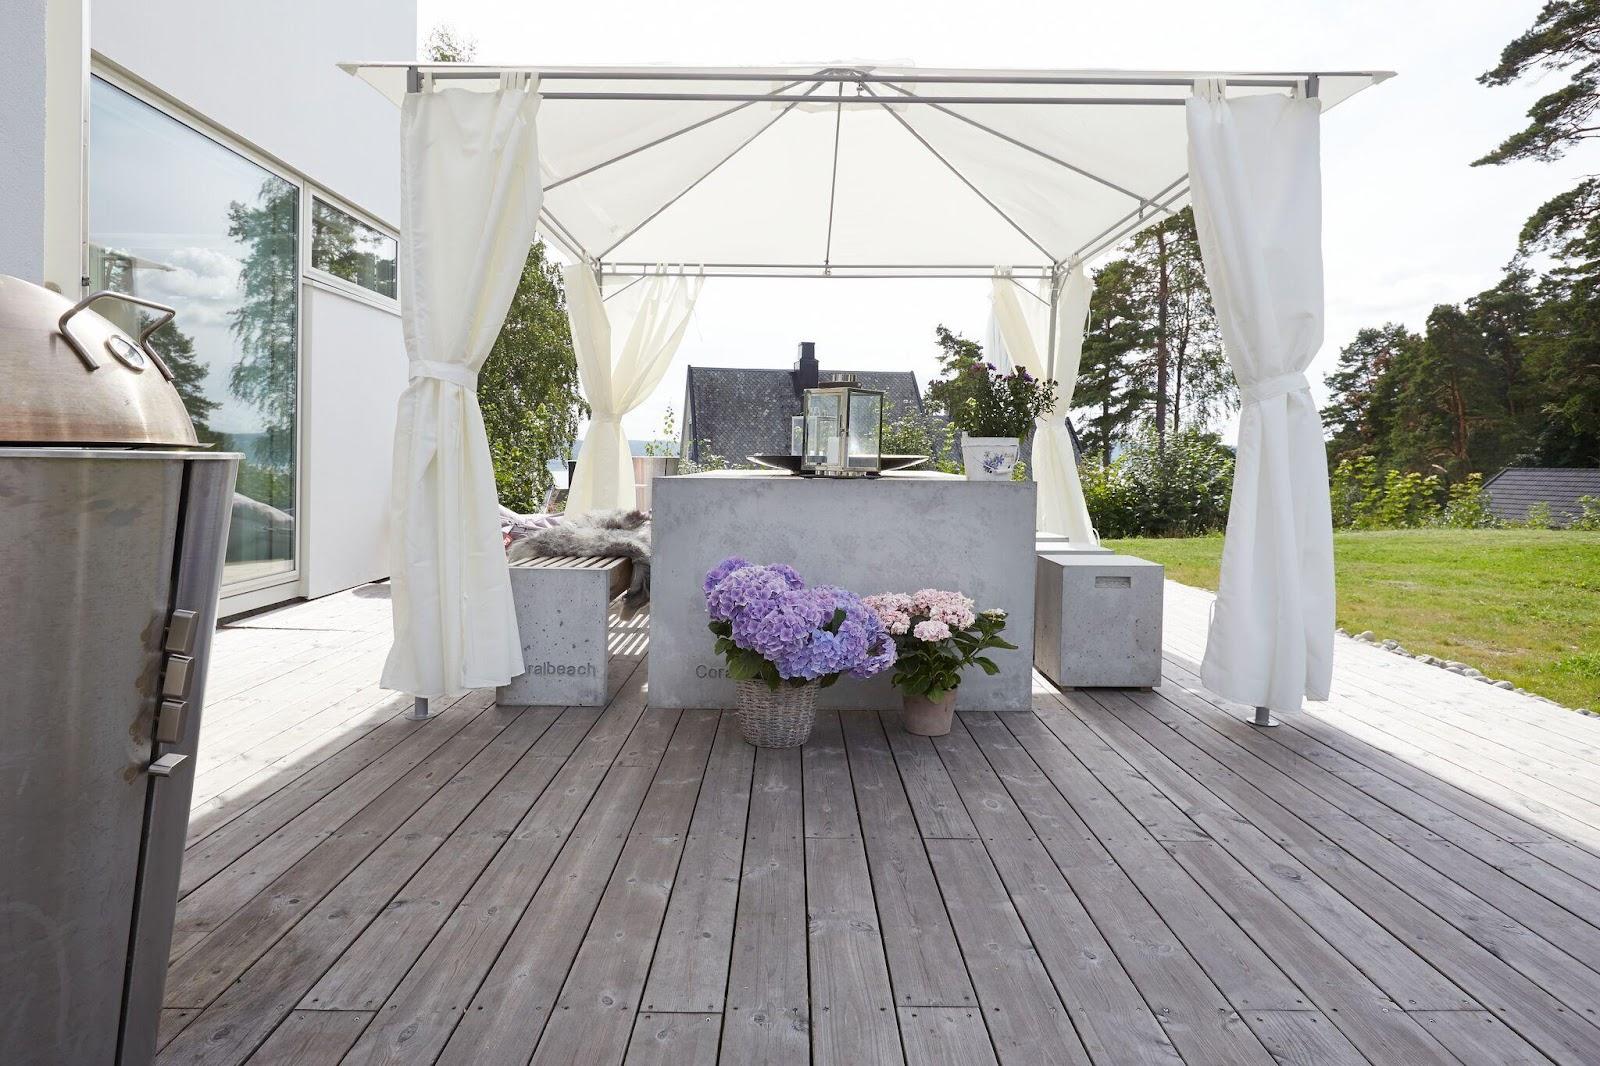 Terrasse med betondetaljer